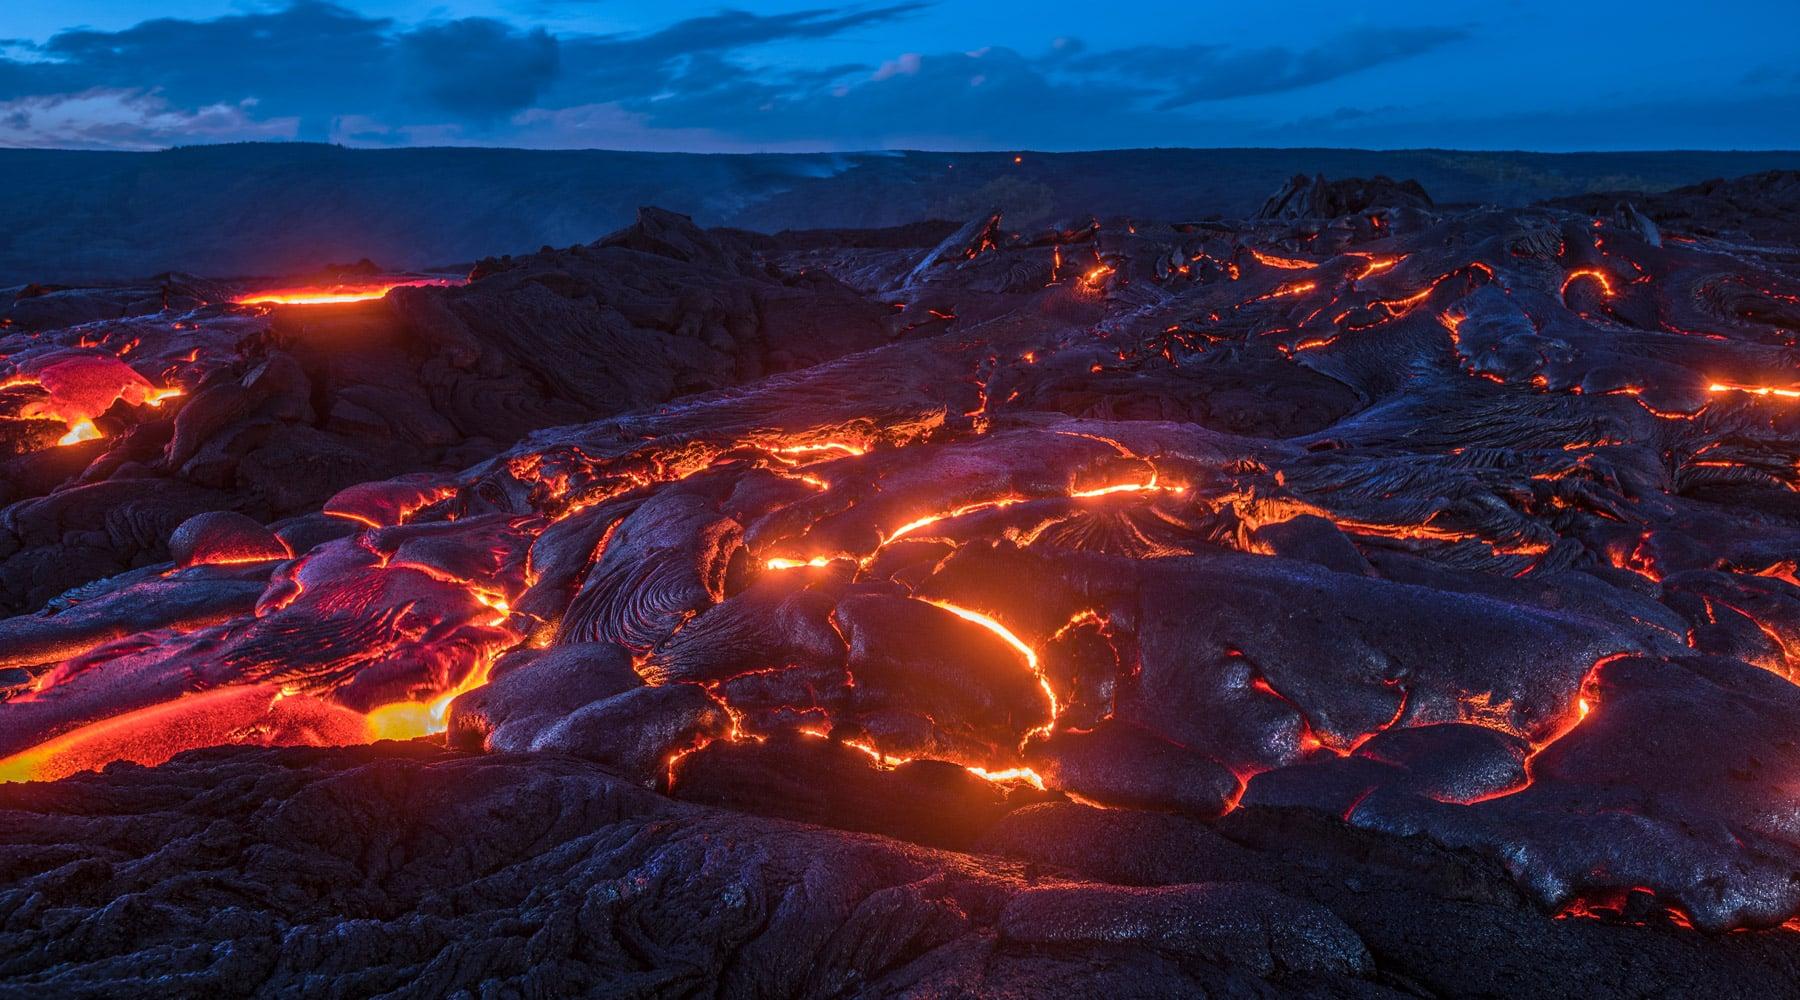 Kilauea, USA – The Most Active Volcano in Hawaii